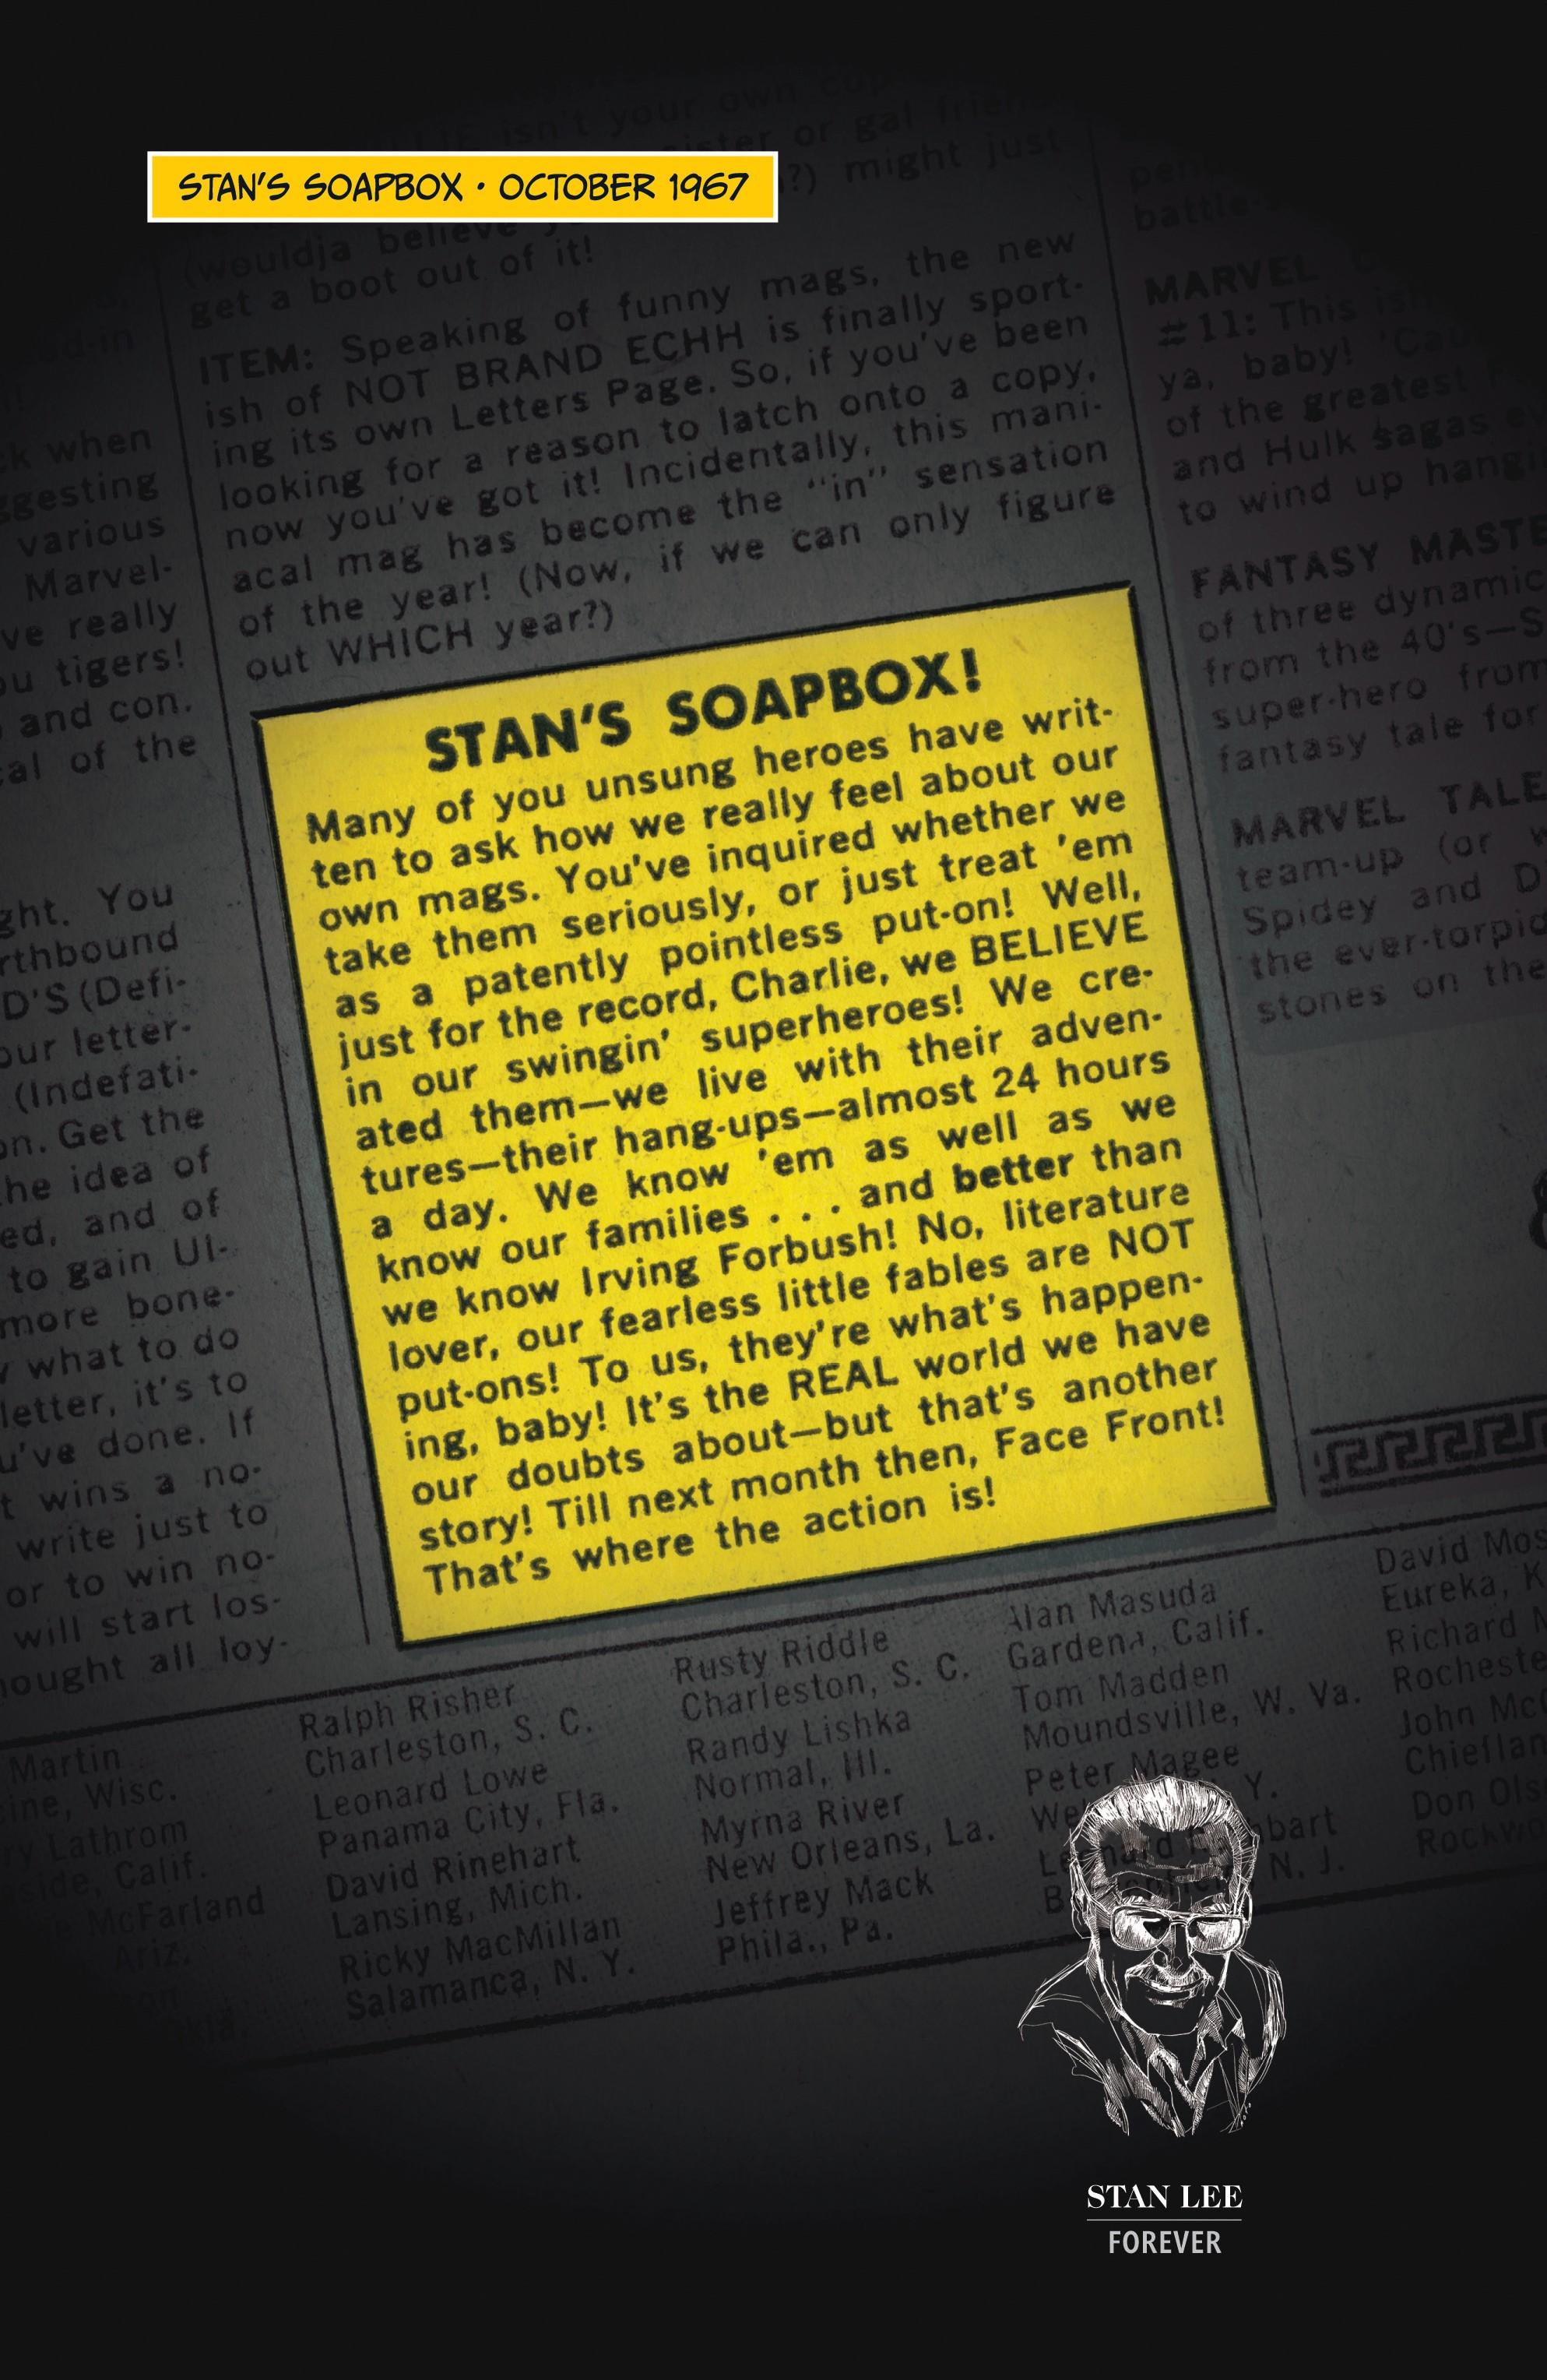 X先生和夫人(2018-): Chapter 10 - Page X先生和夫人(2018-)